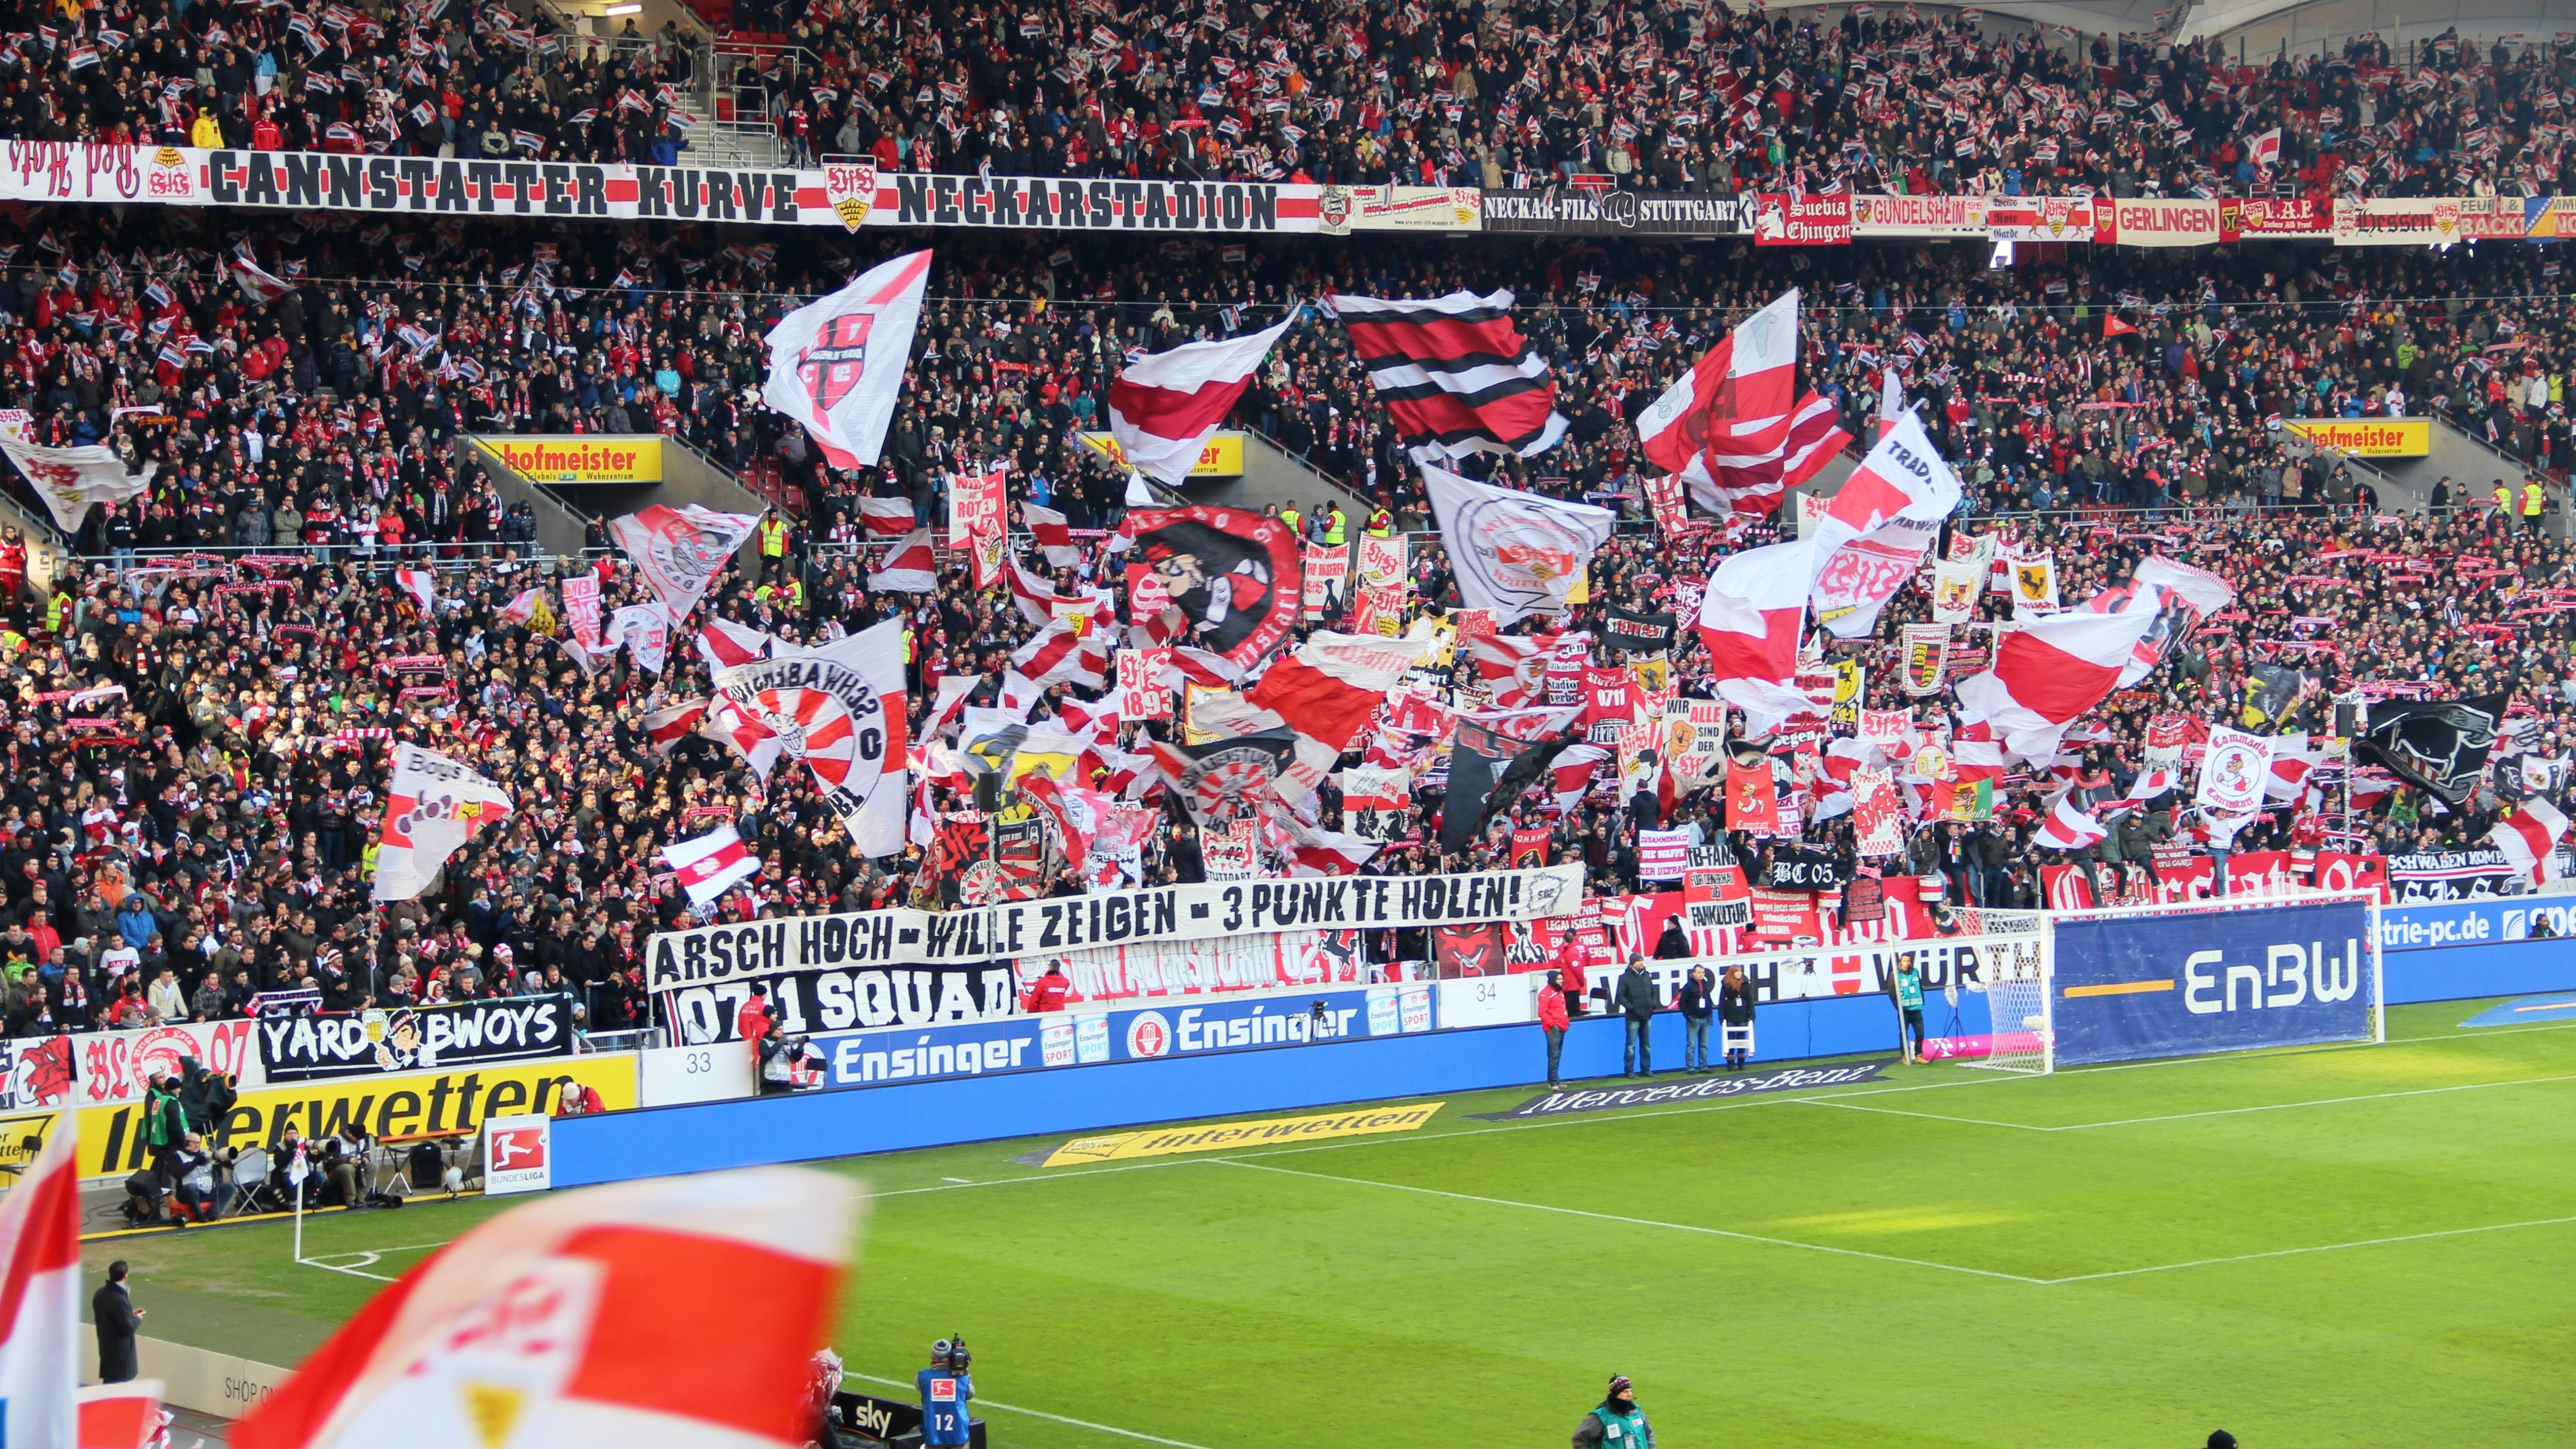 Crowd at Mercedes-Benz Arena in Stuttgart wallpaper